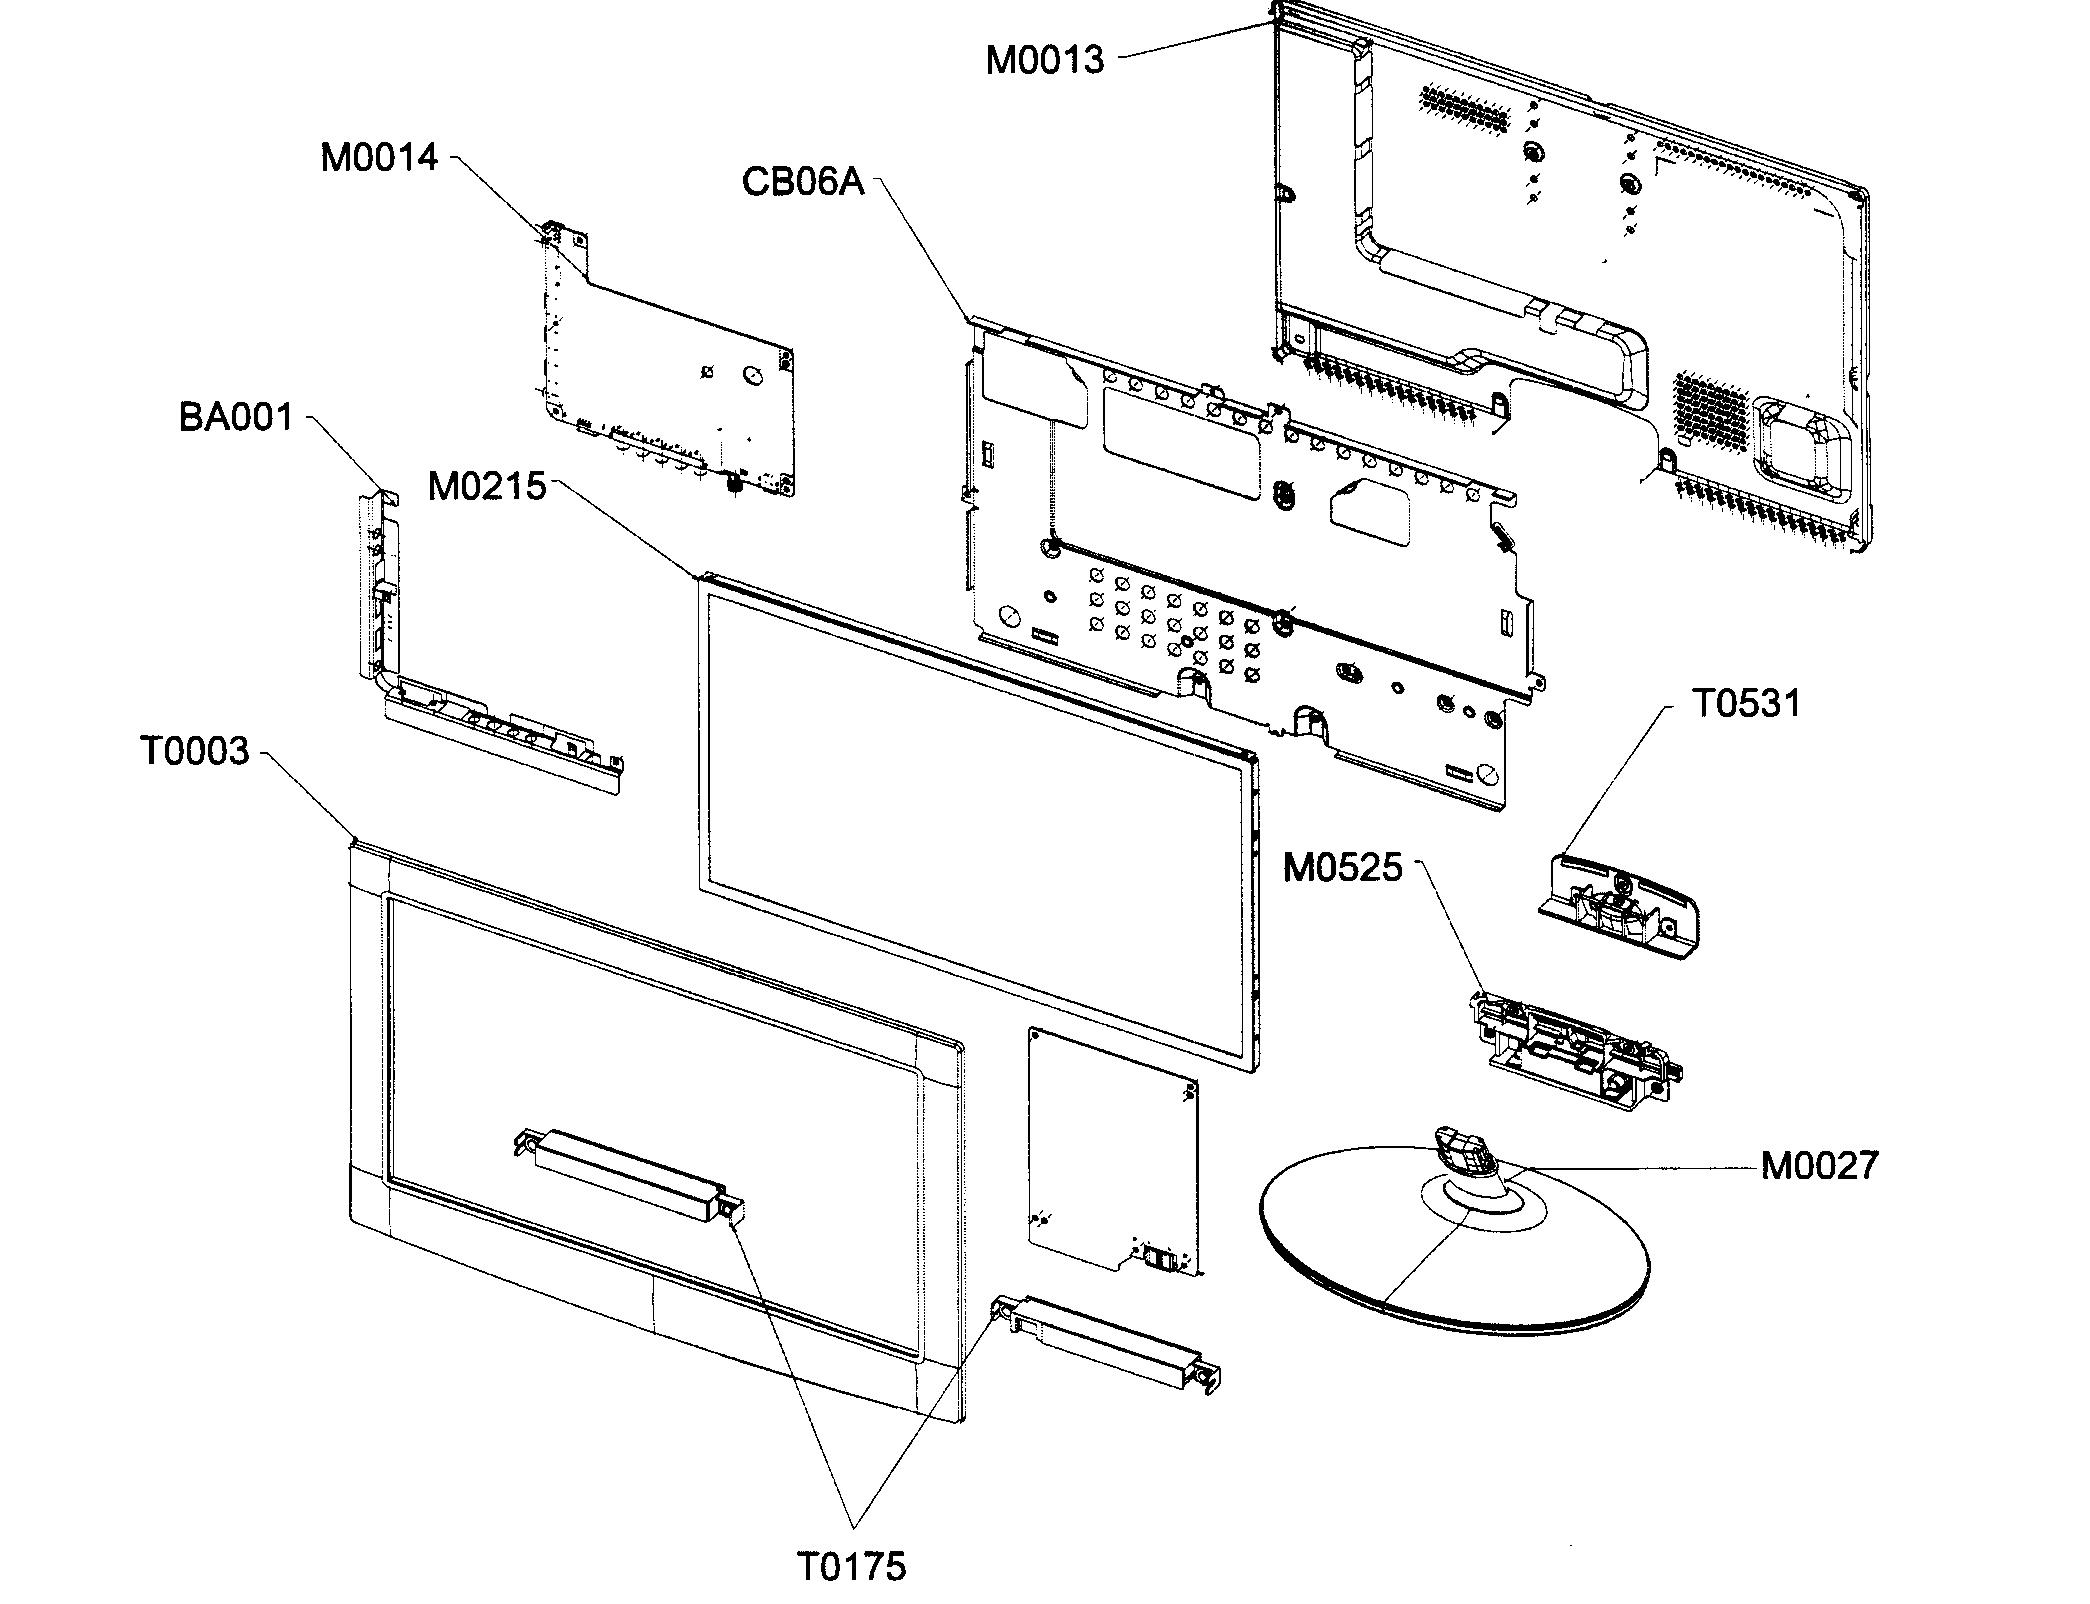 Sony Vizio Schematic Magnavox Schematics ~ Elsavadorla